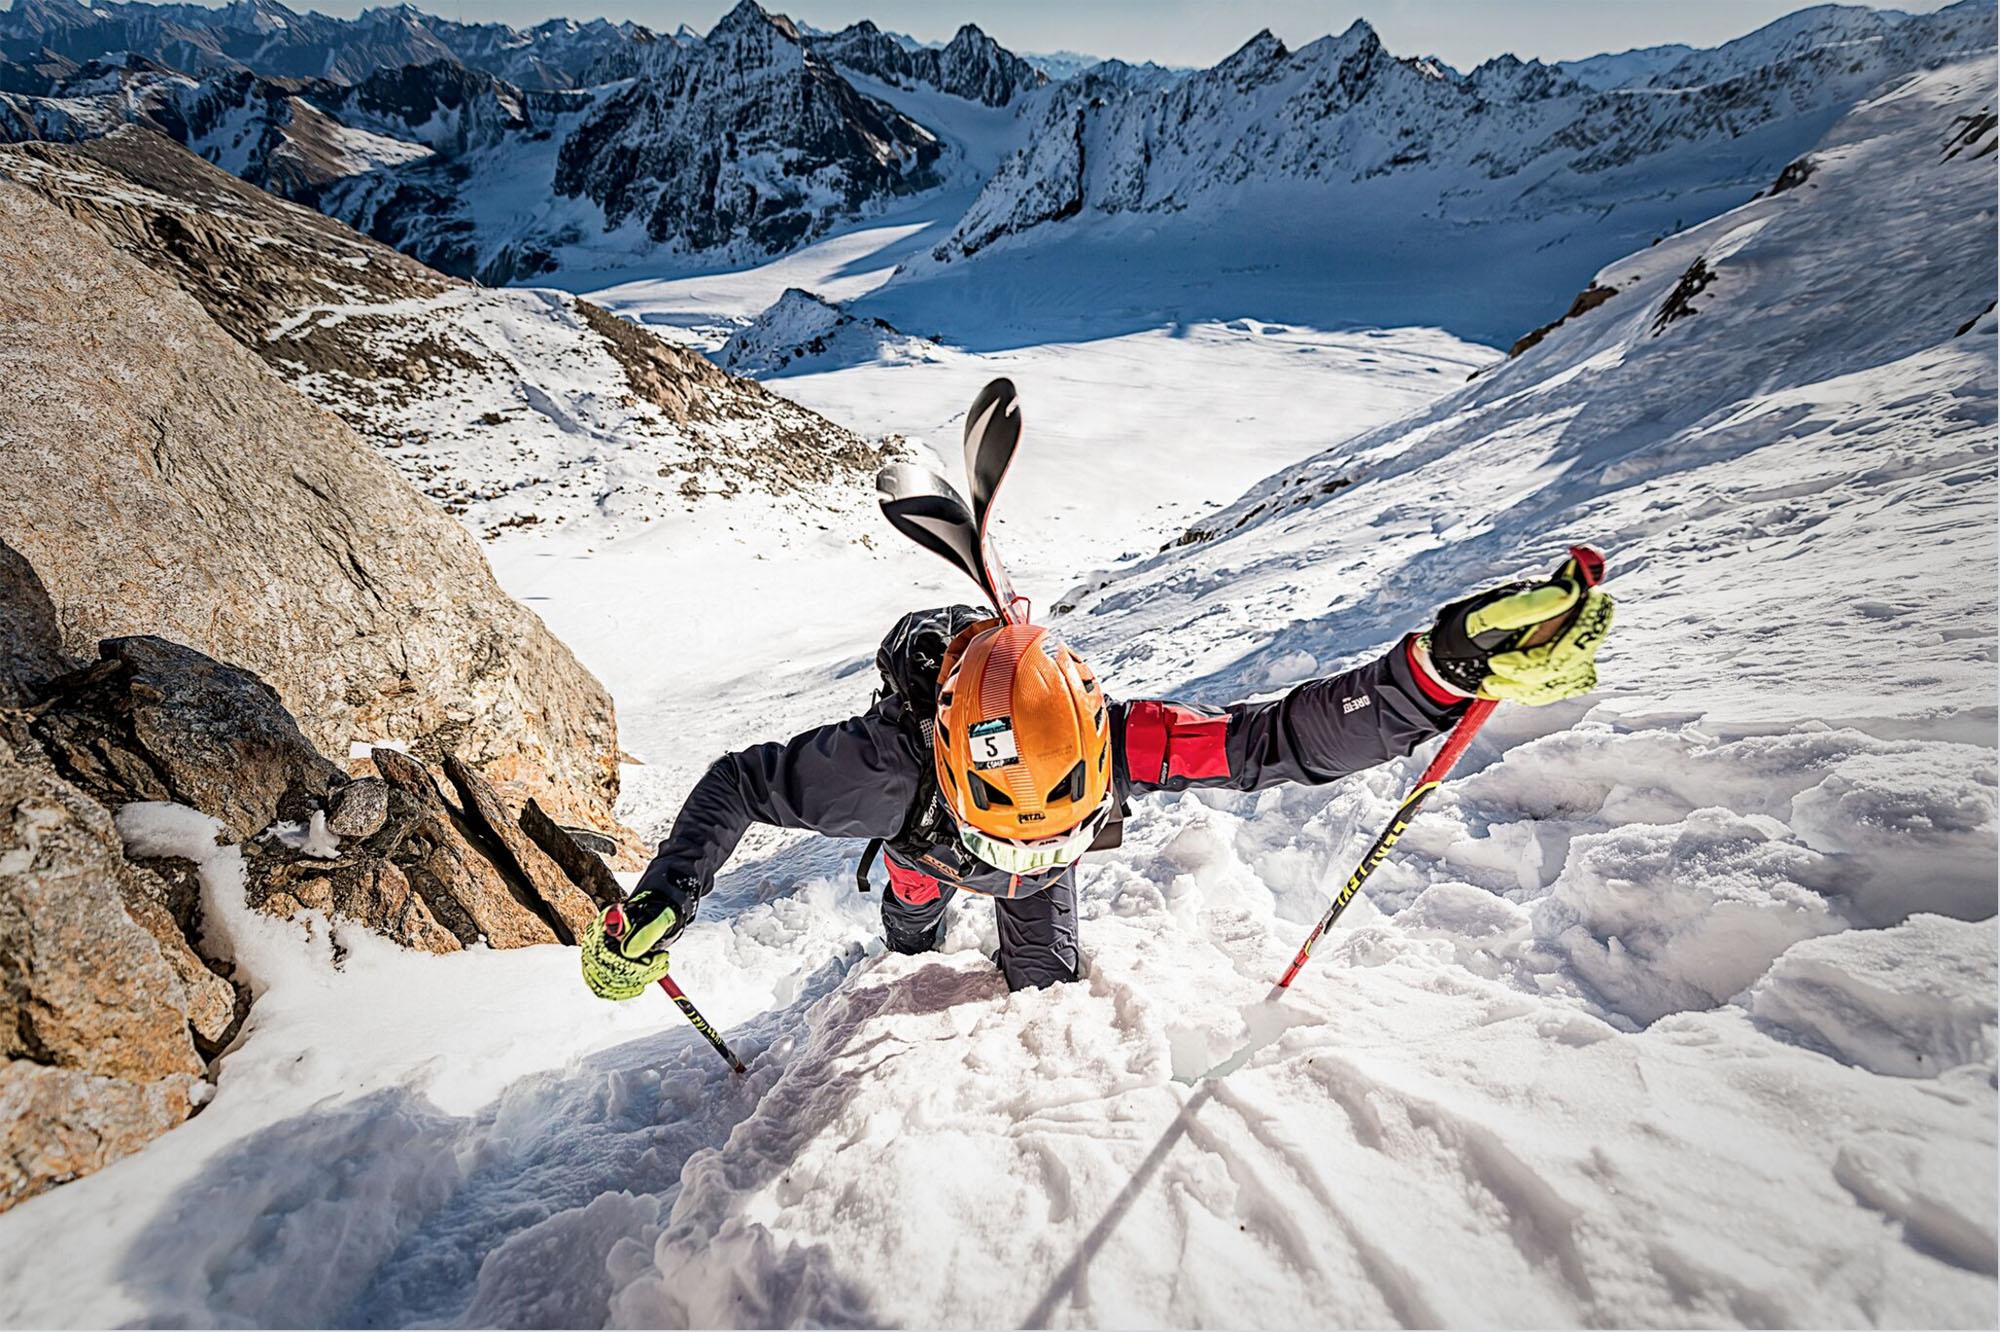 Deutscher Alpen Verein - Skimo Saison © Andres Beregovich